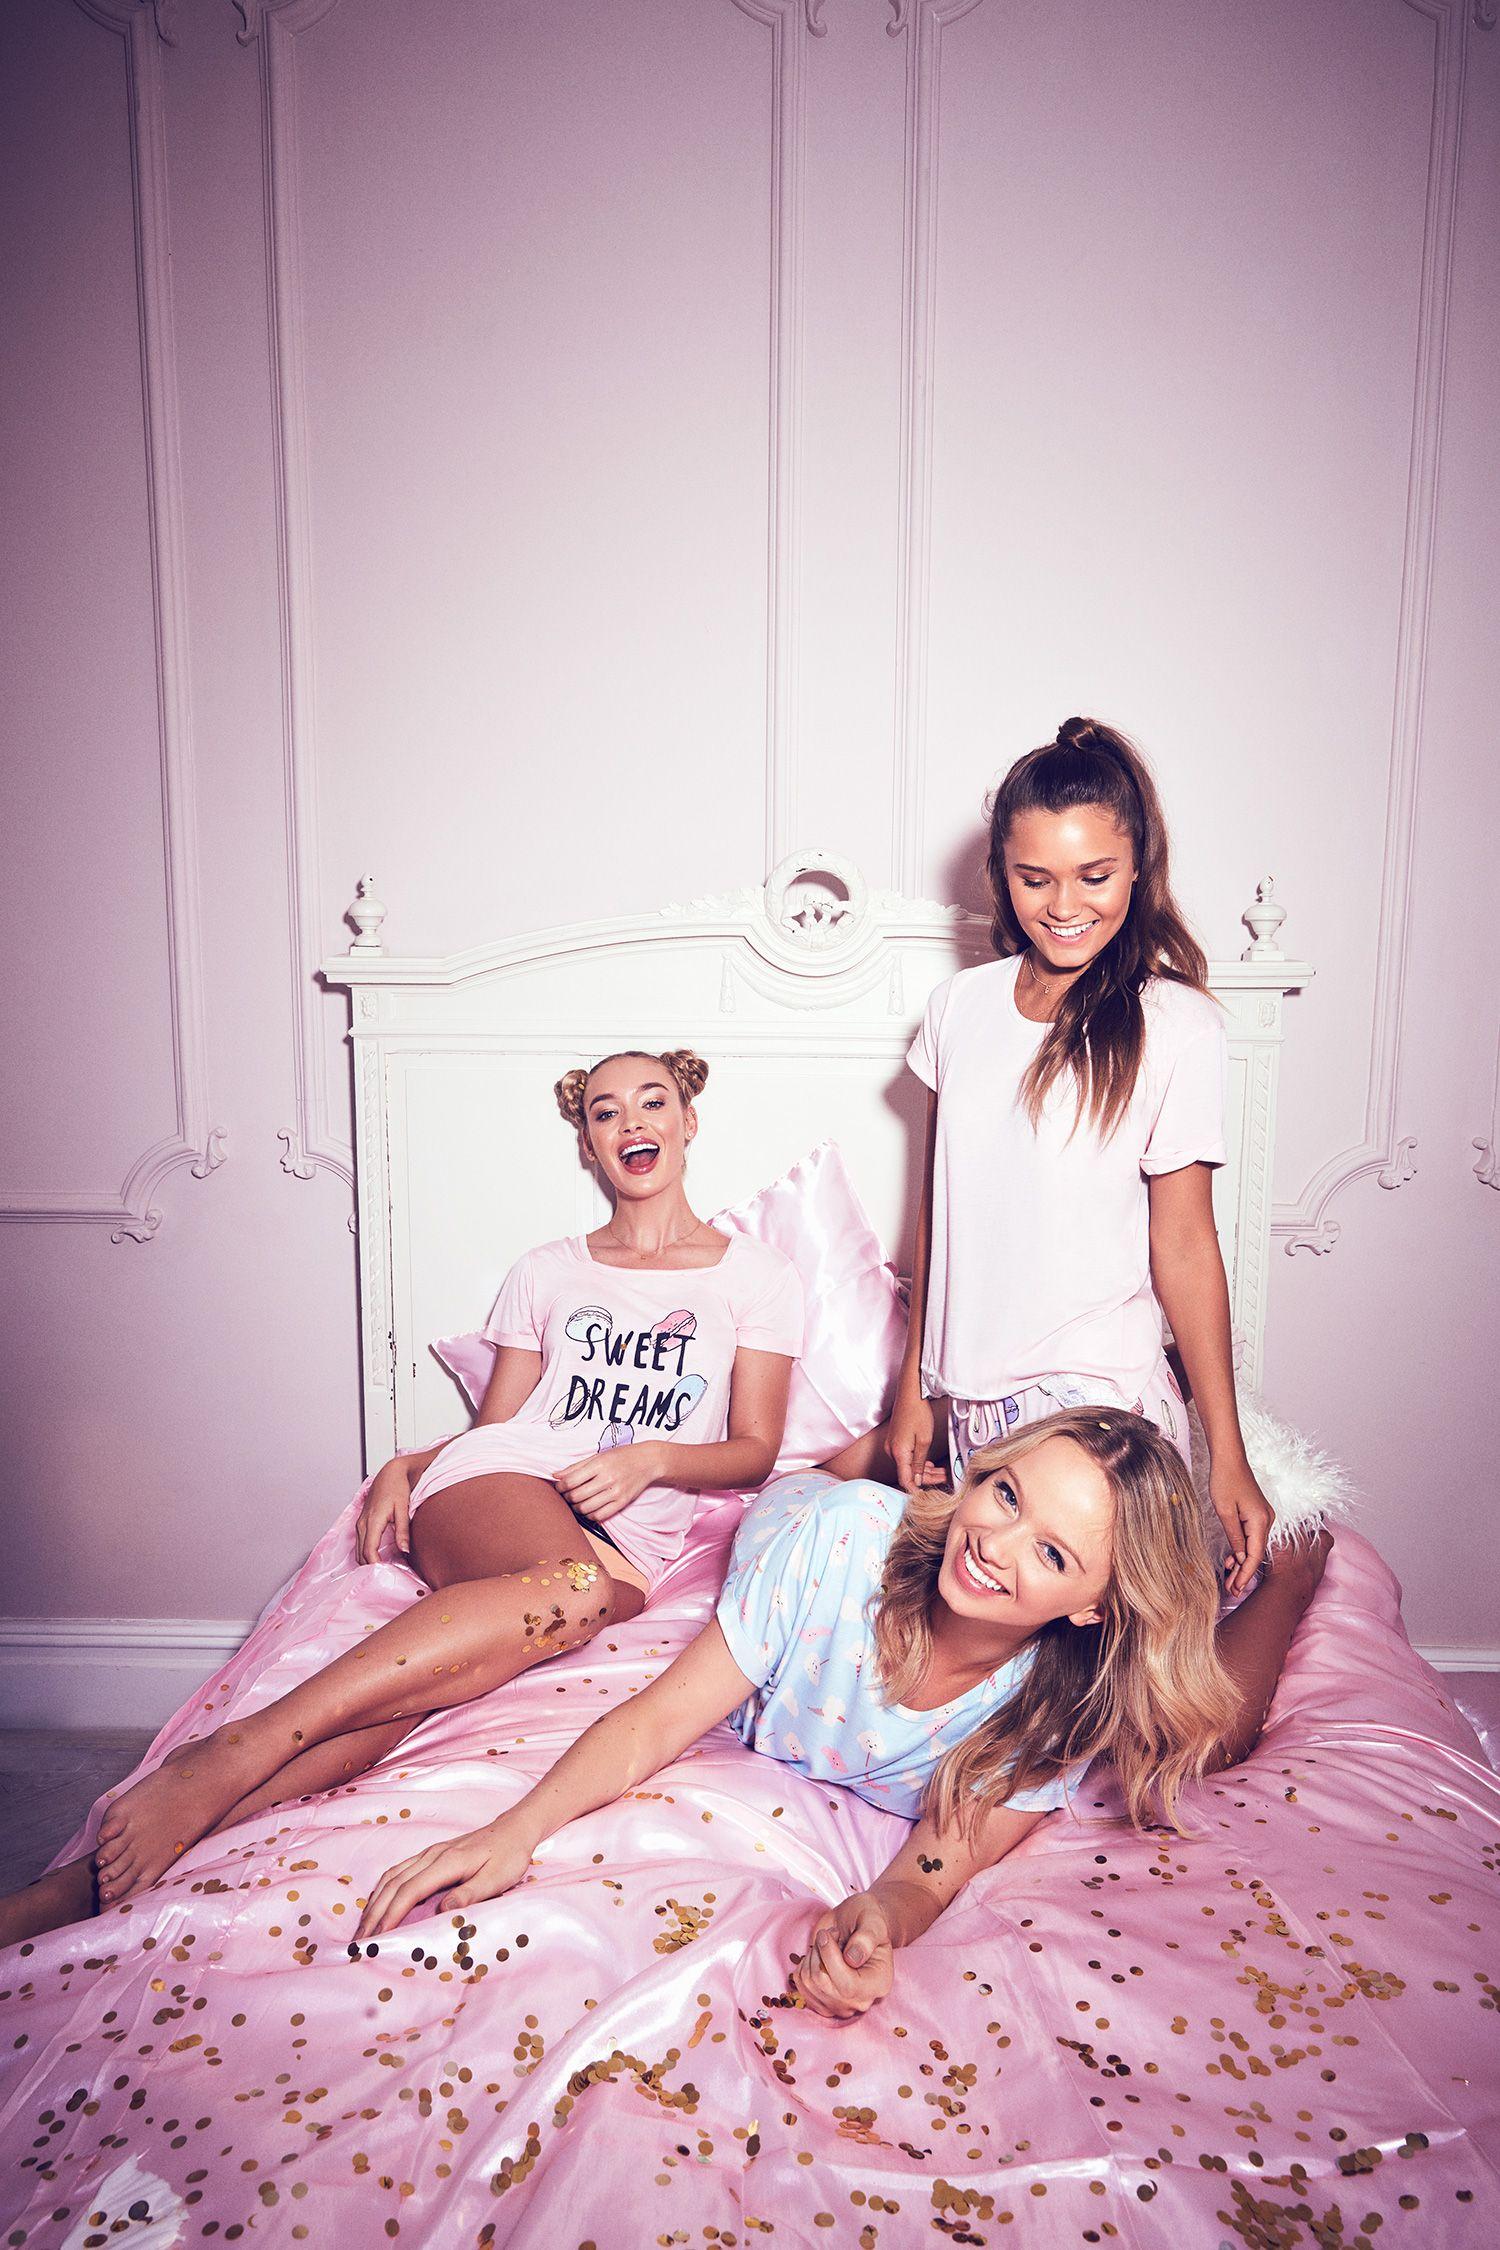 chelsea-peers-fashion-sleepwear-pyjama-lingerie-shoot-london-cute-2